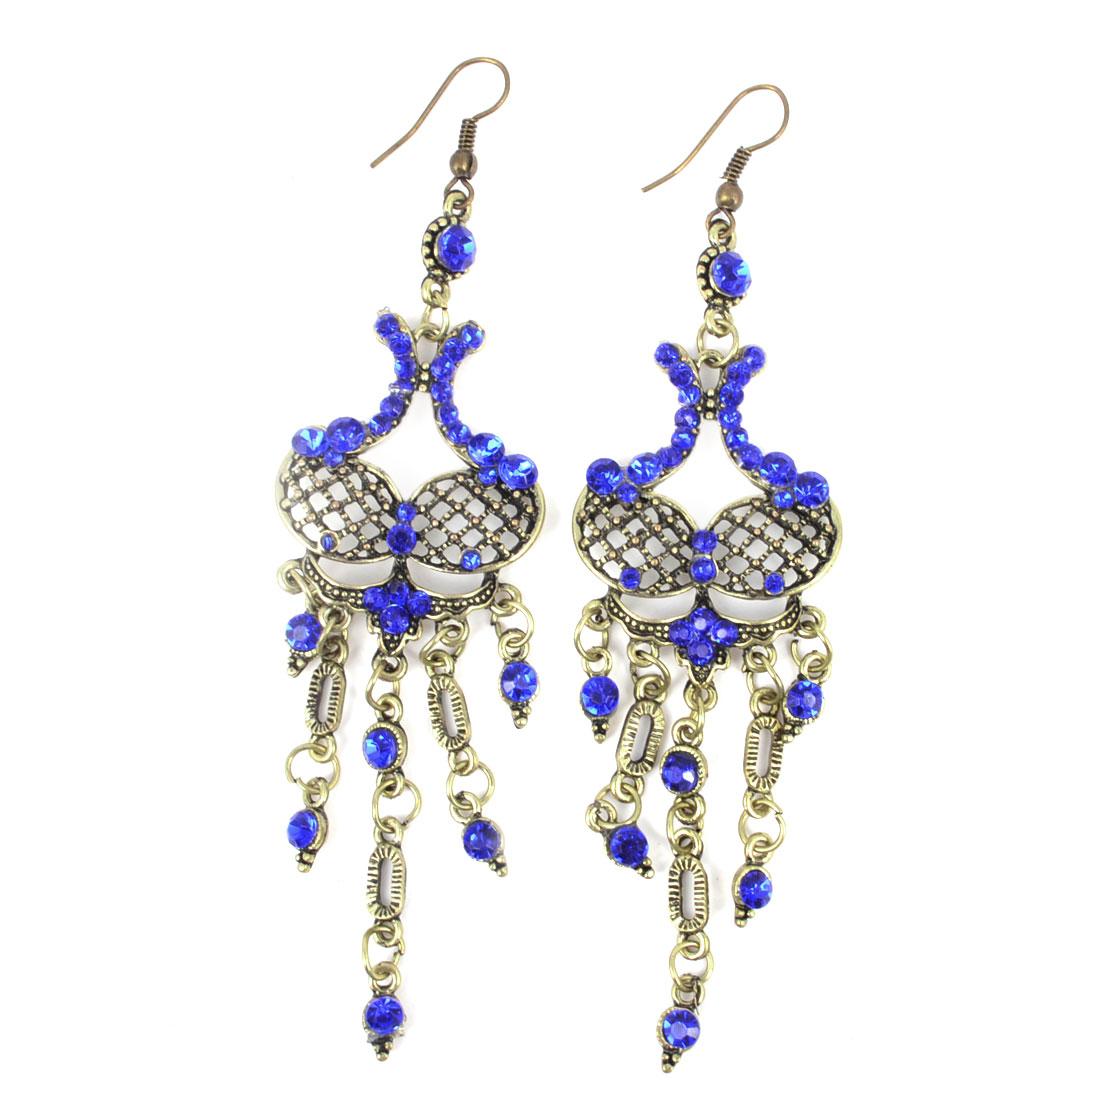 Pair Women Retro Chandelier Pendent Fish Hook Earrings Dark Blue Bronze Tone